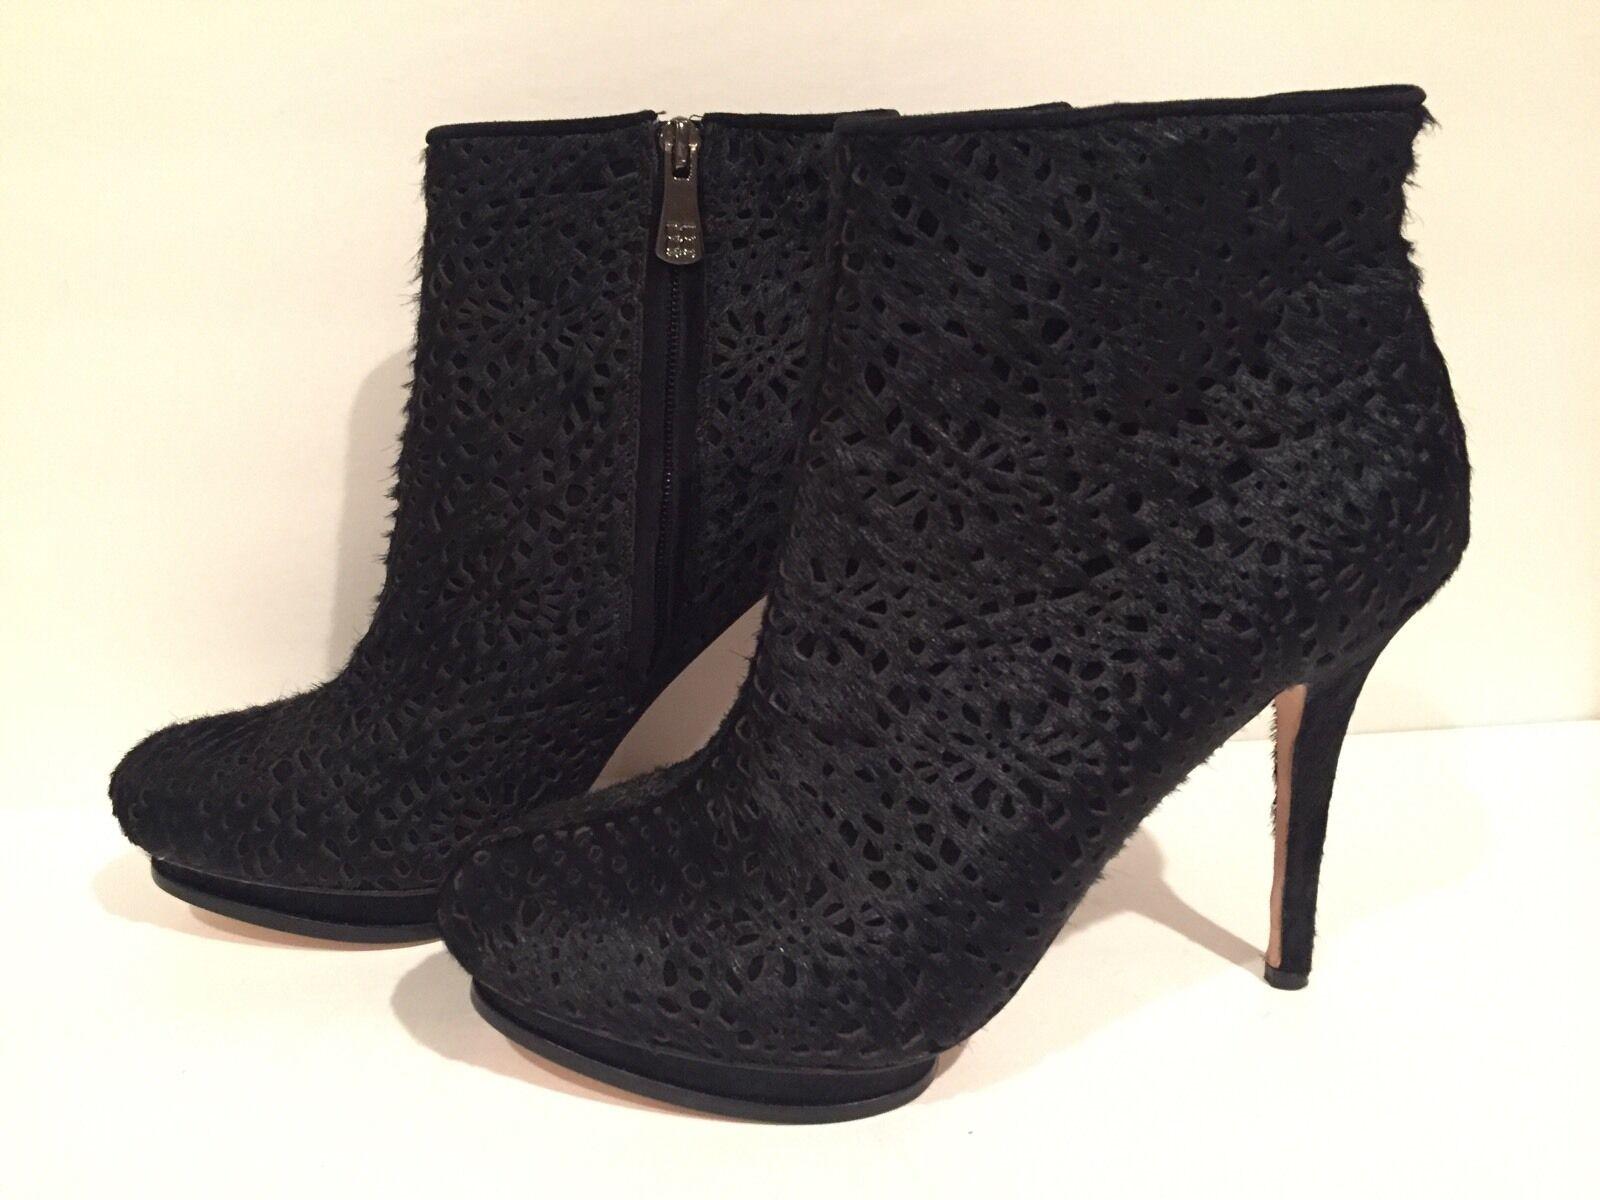 BCBG Max Azria Ven Ankle Boots Heel Zip Pony Hair Black 9.5 B  290 & Up New